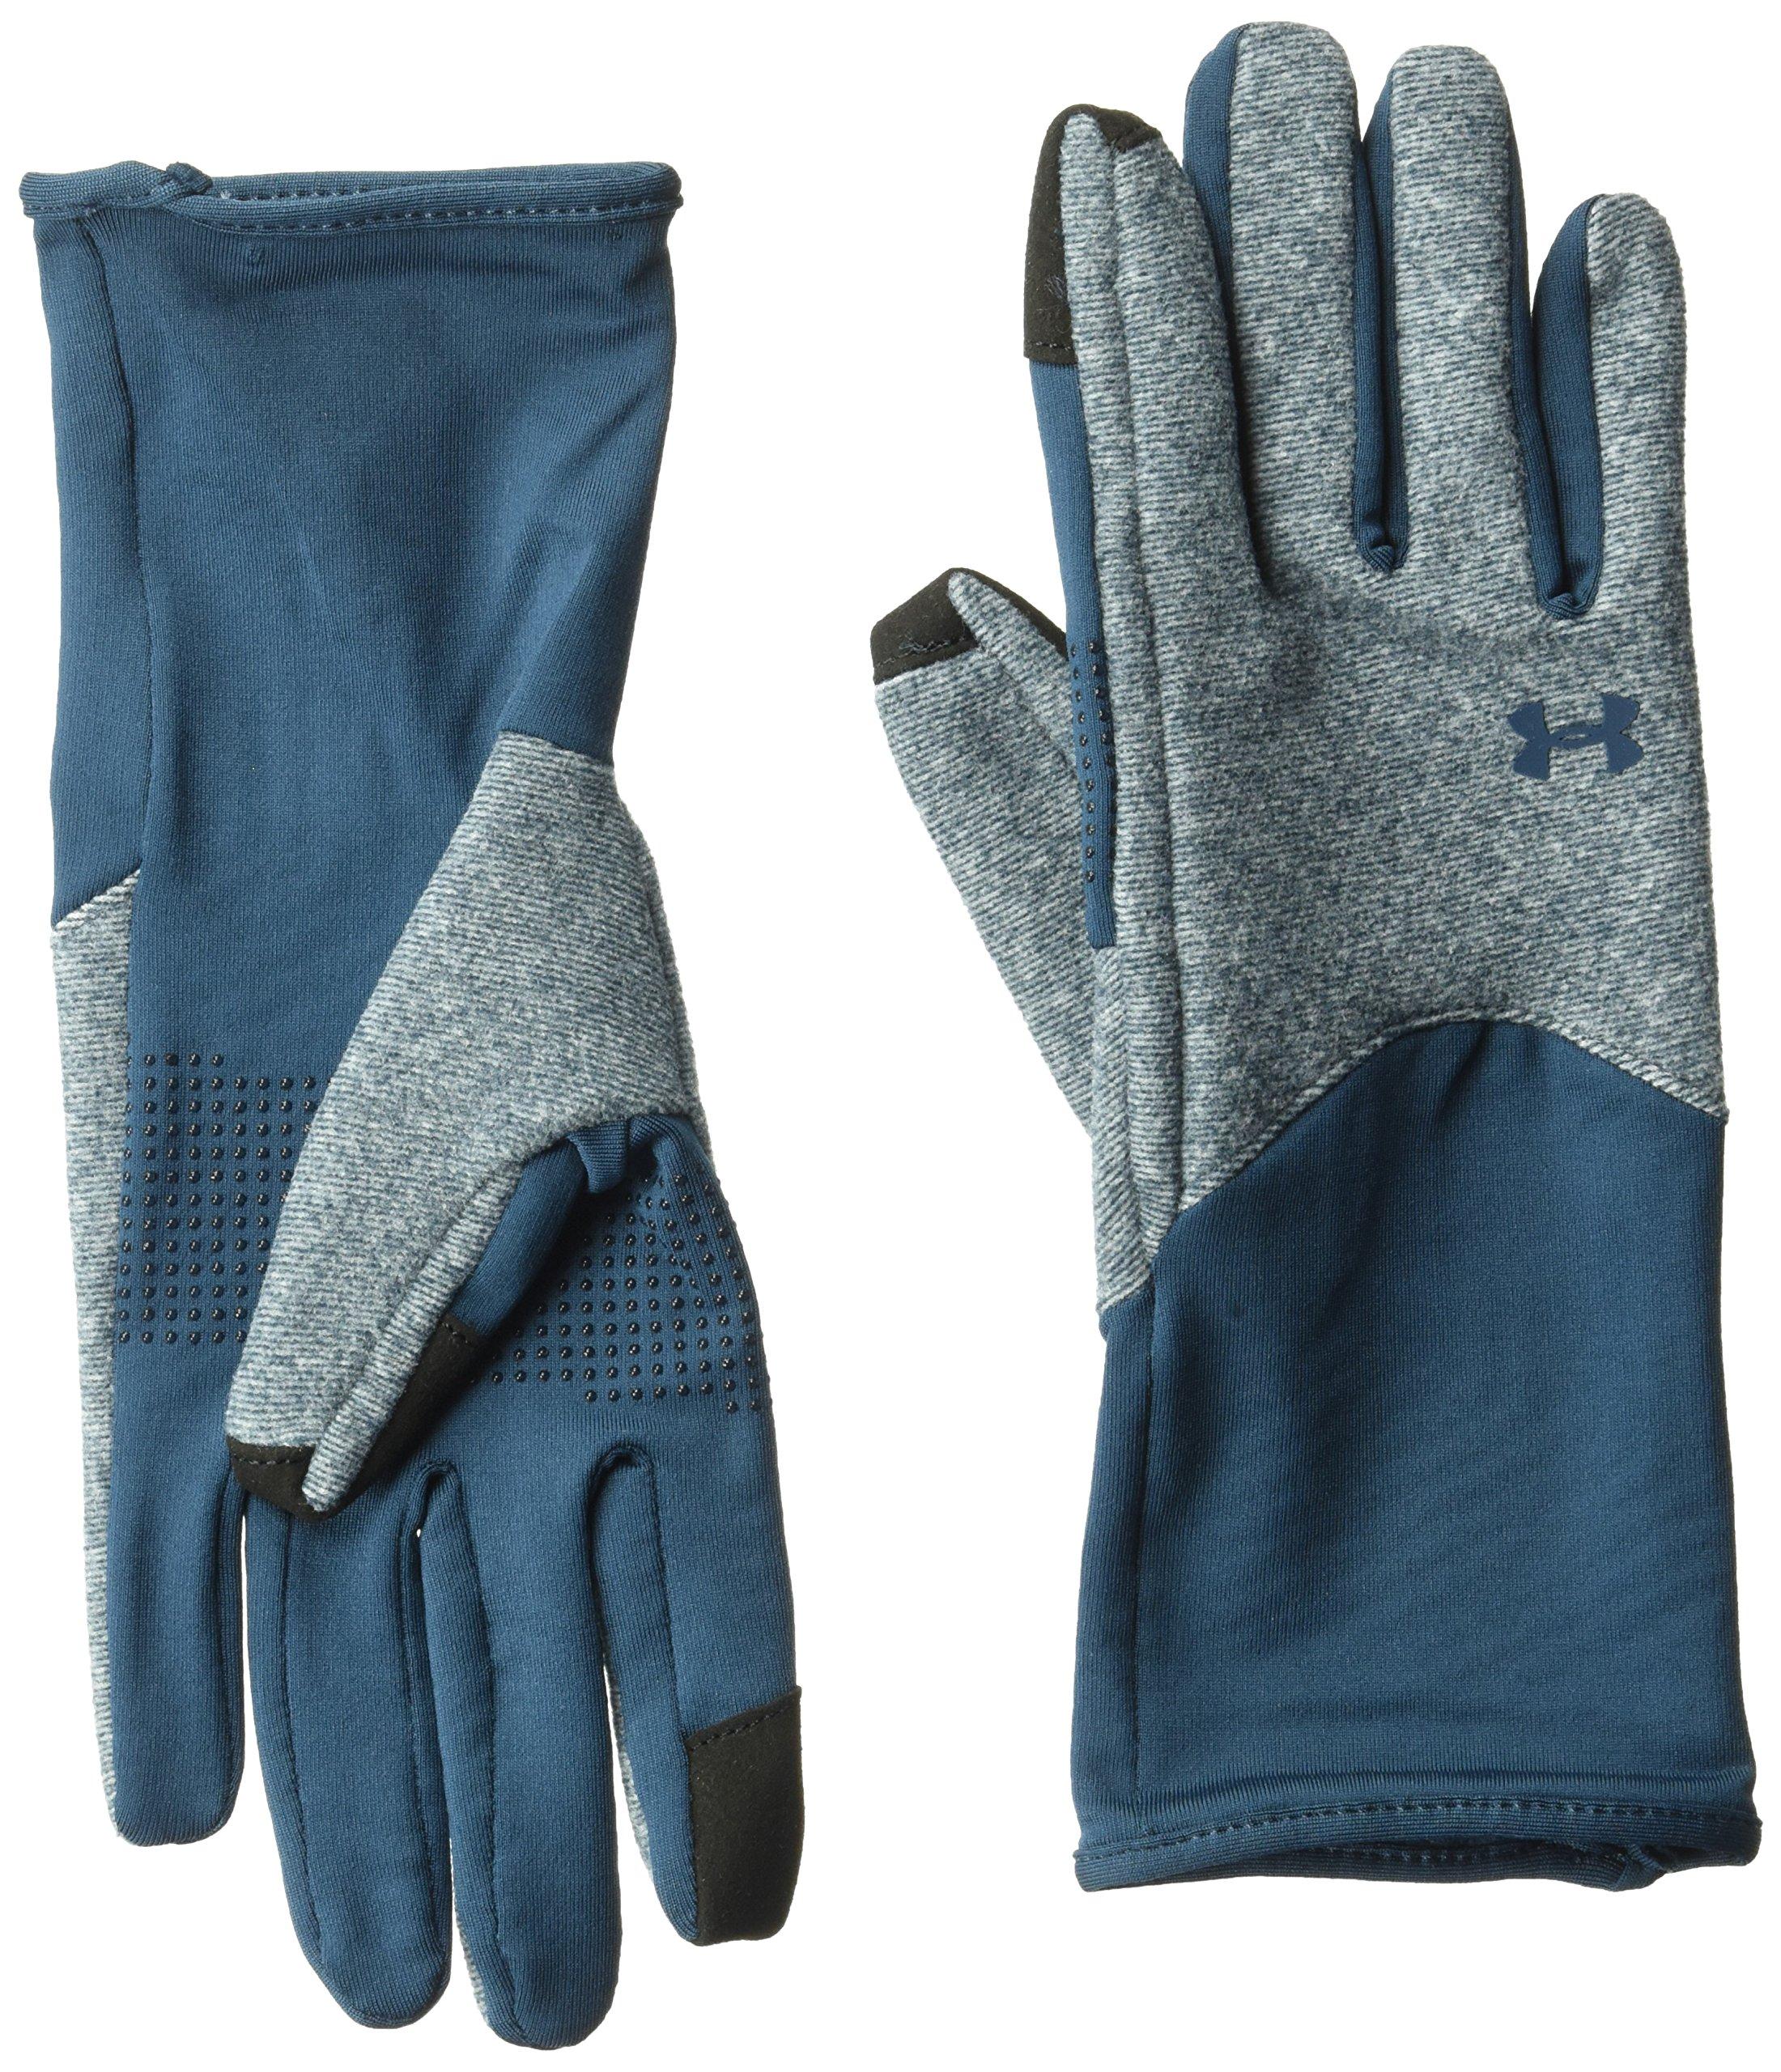 Under Armour Women's ColdGear Infrared Fleece Gloves, True Ink (918)/True Ink, Large